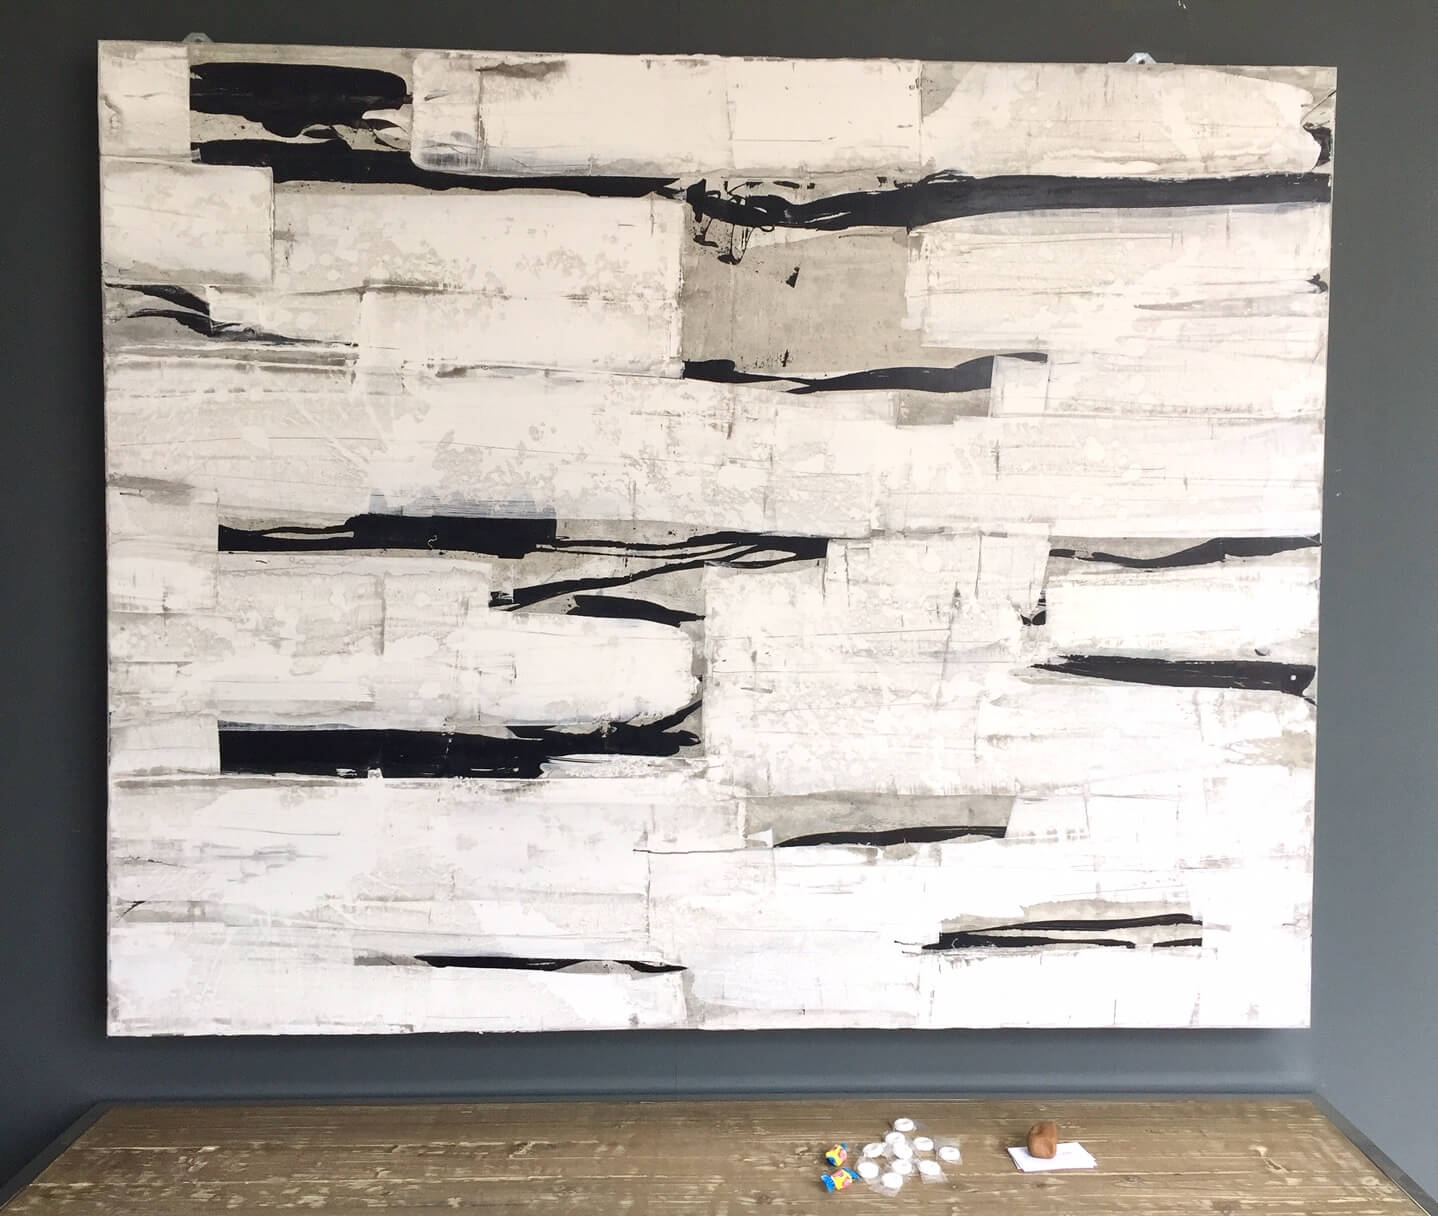 Venetian plaster wall art by Scott Kerr seen at Round Top, TX #walldecor #venetianplaster #wallart